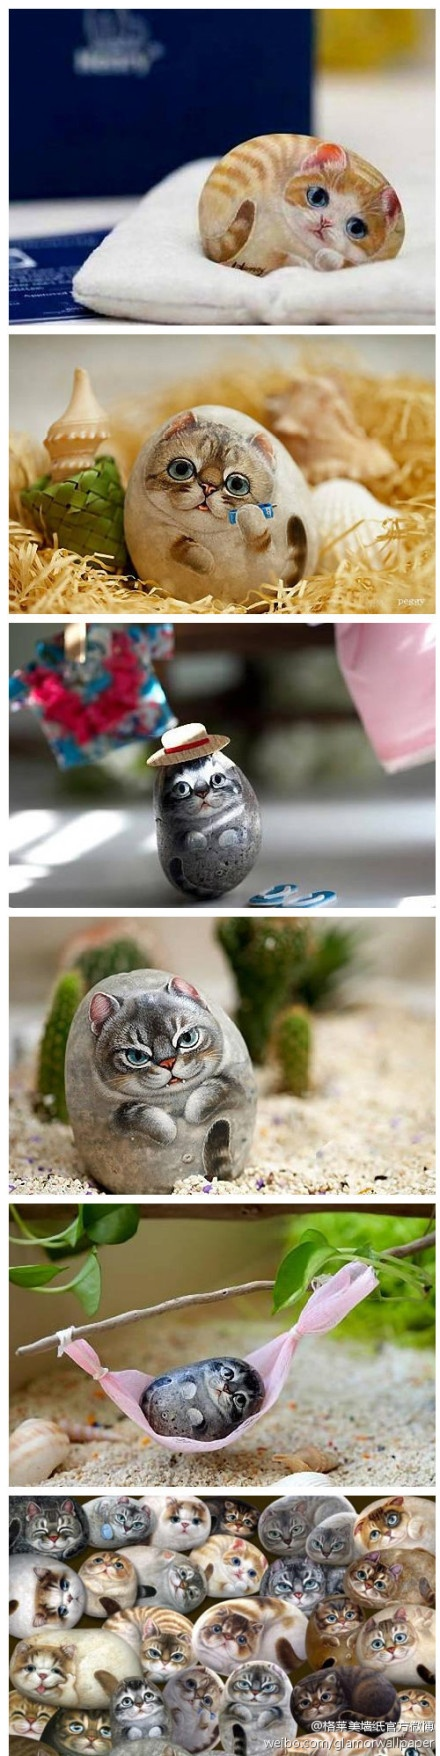 stone painting art (cats)